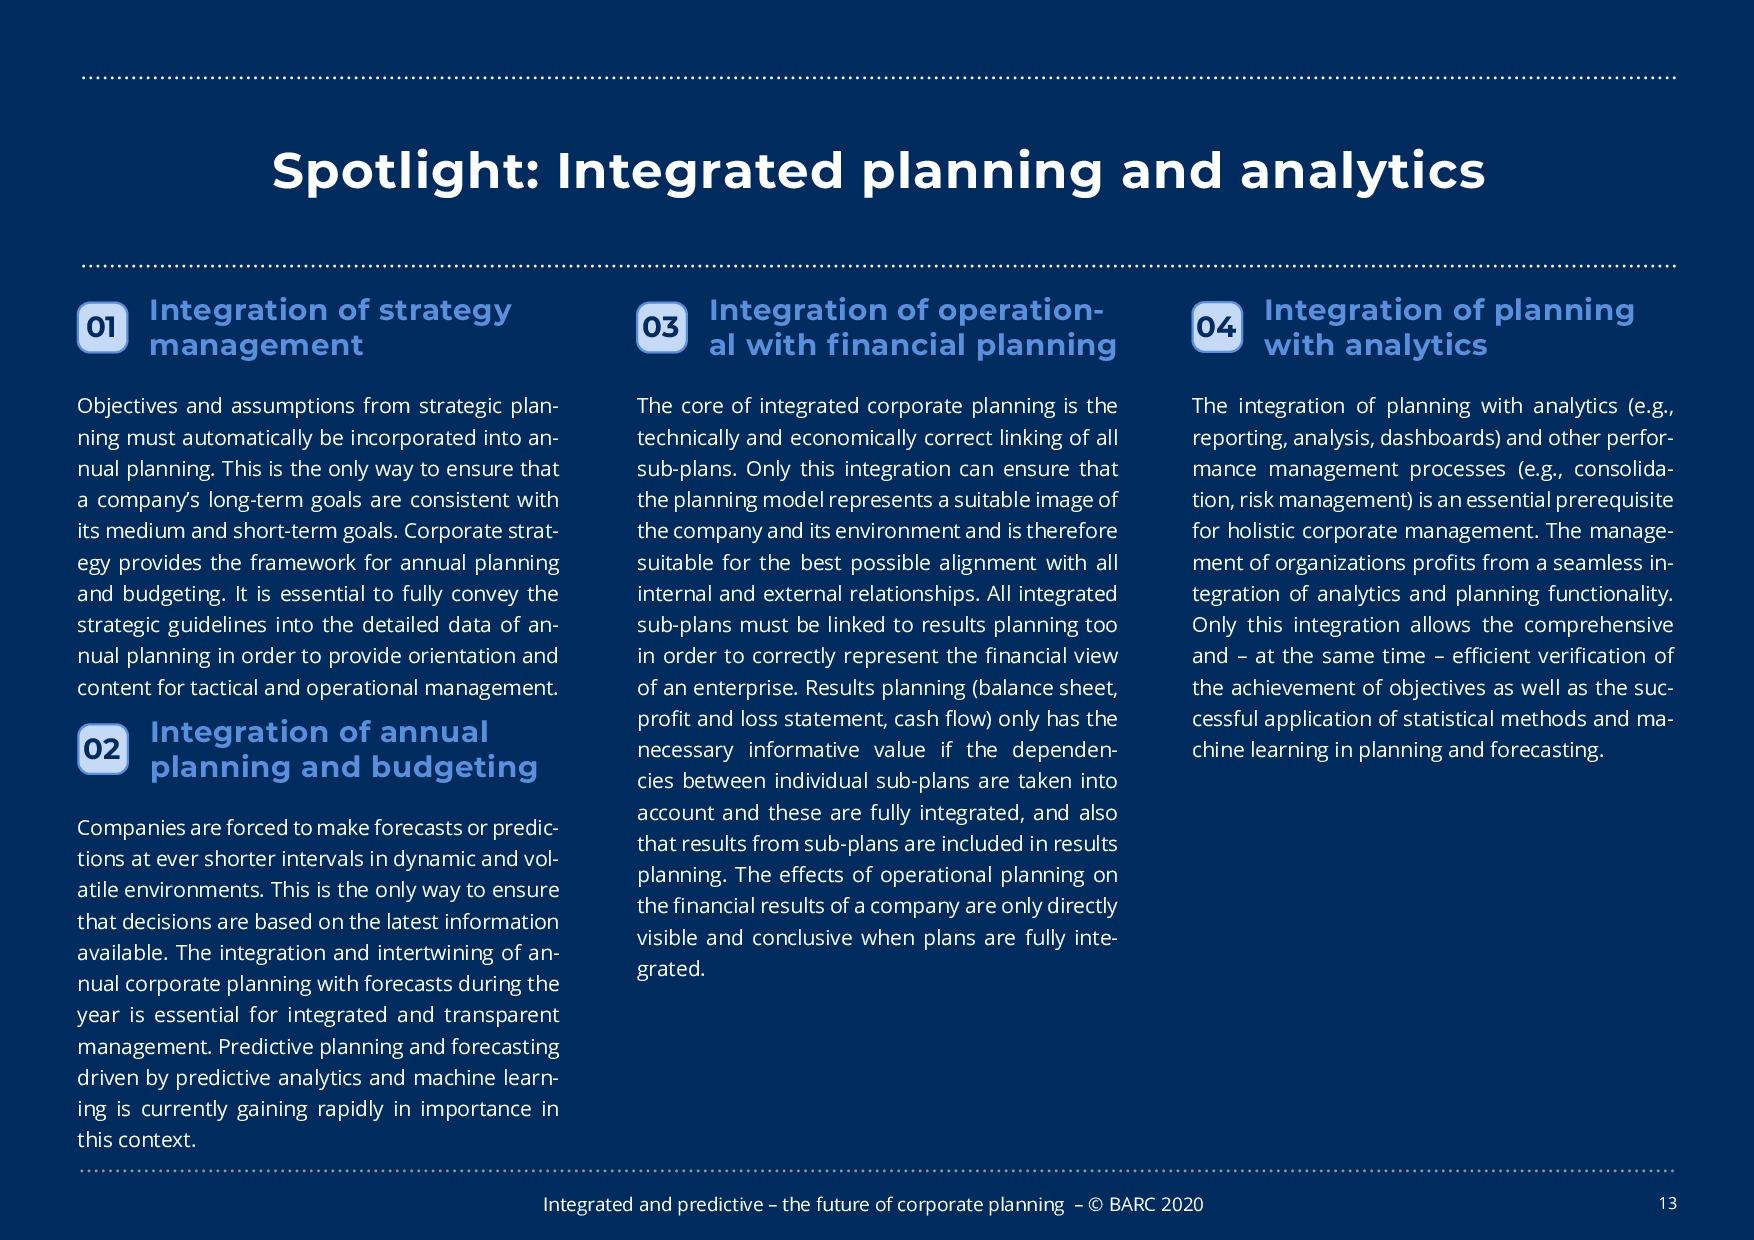 BARC – 統合と予測 – 経営計画の未来 | Page 13